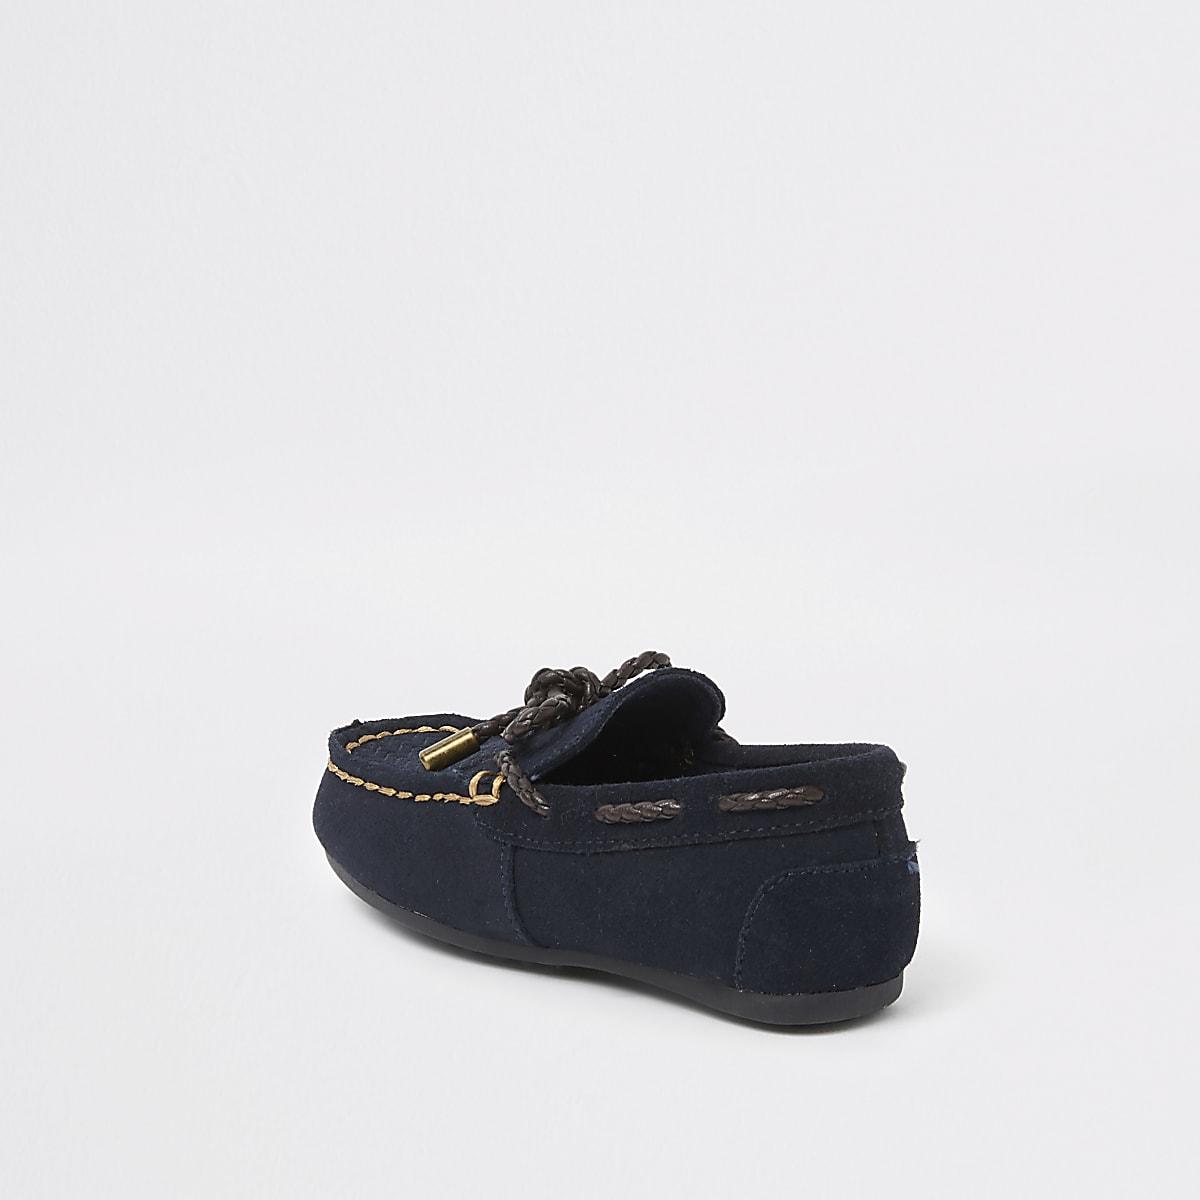 9f0436be97f Mini boys navy driver shoes - Baby Boys Shoes - Baby Boys Shoes ...